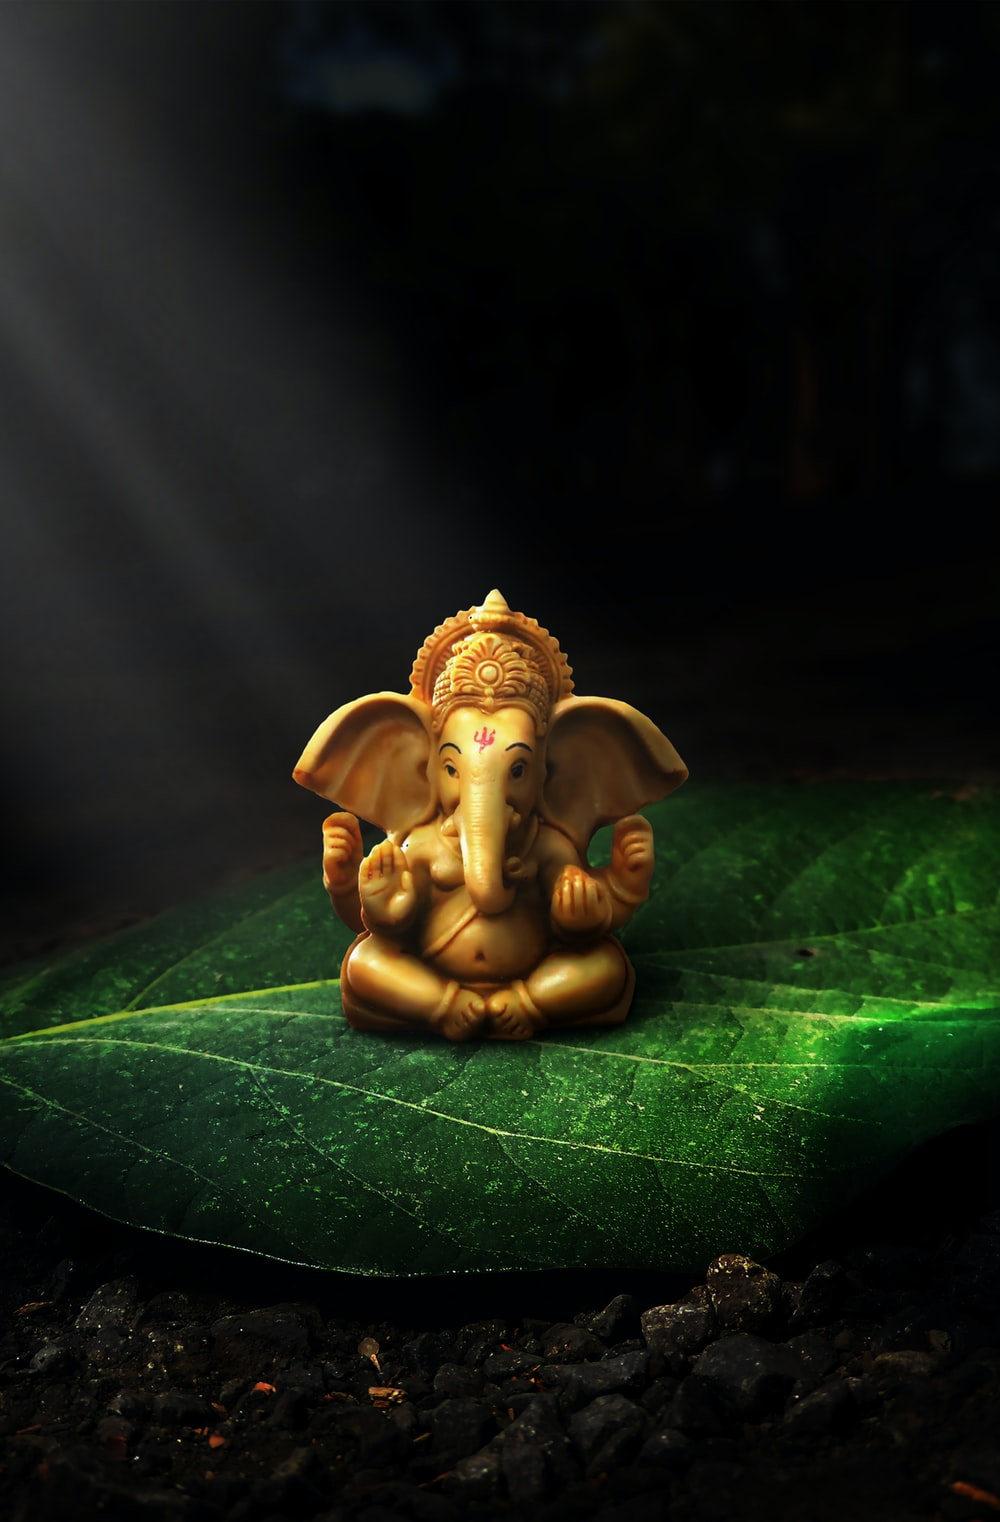 500 Ganesh Pictures Hd Download Free Images On Unsplash